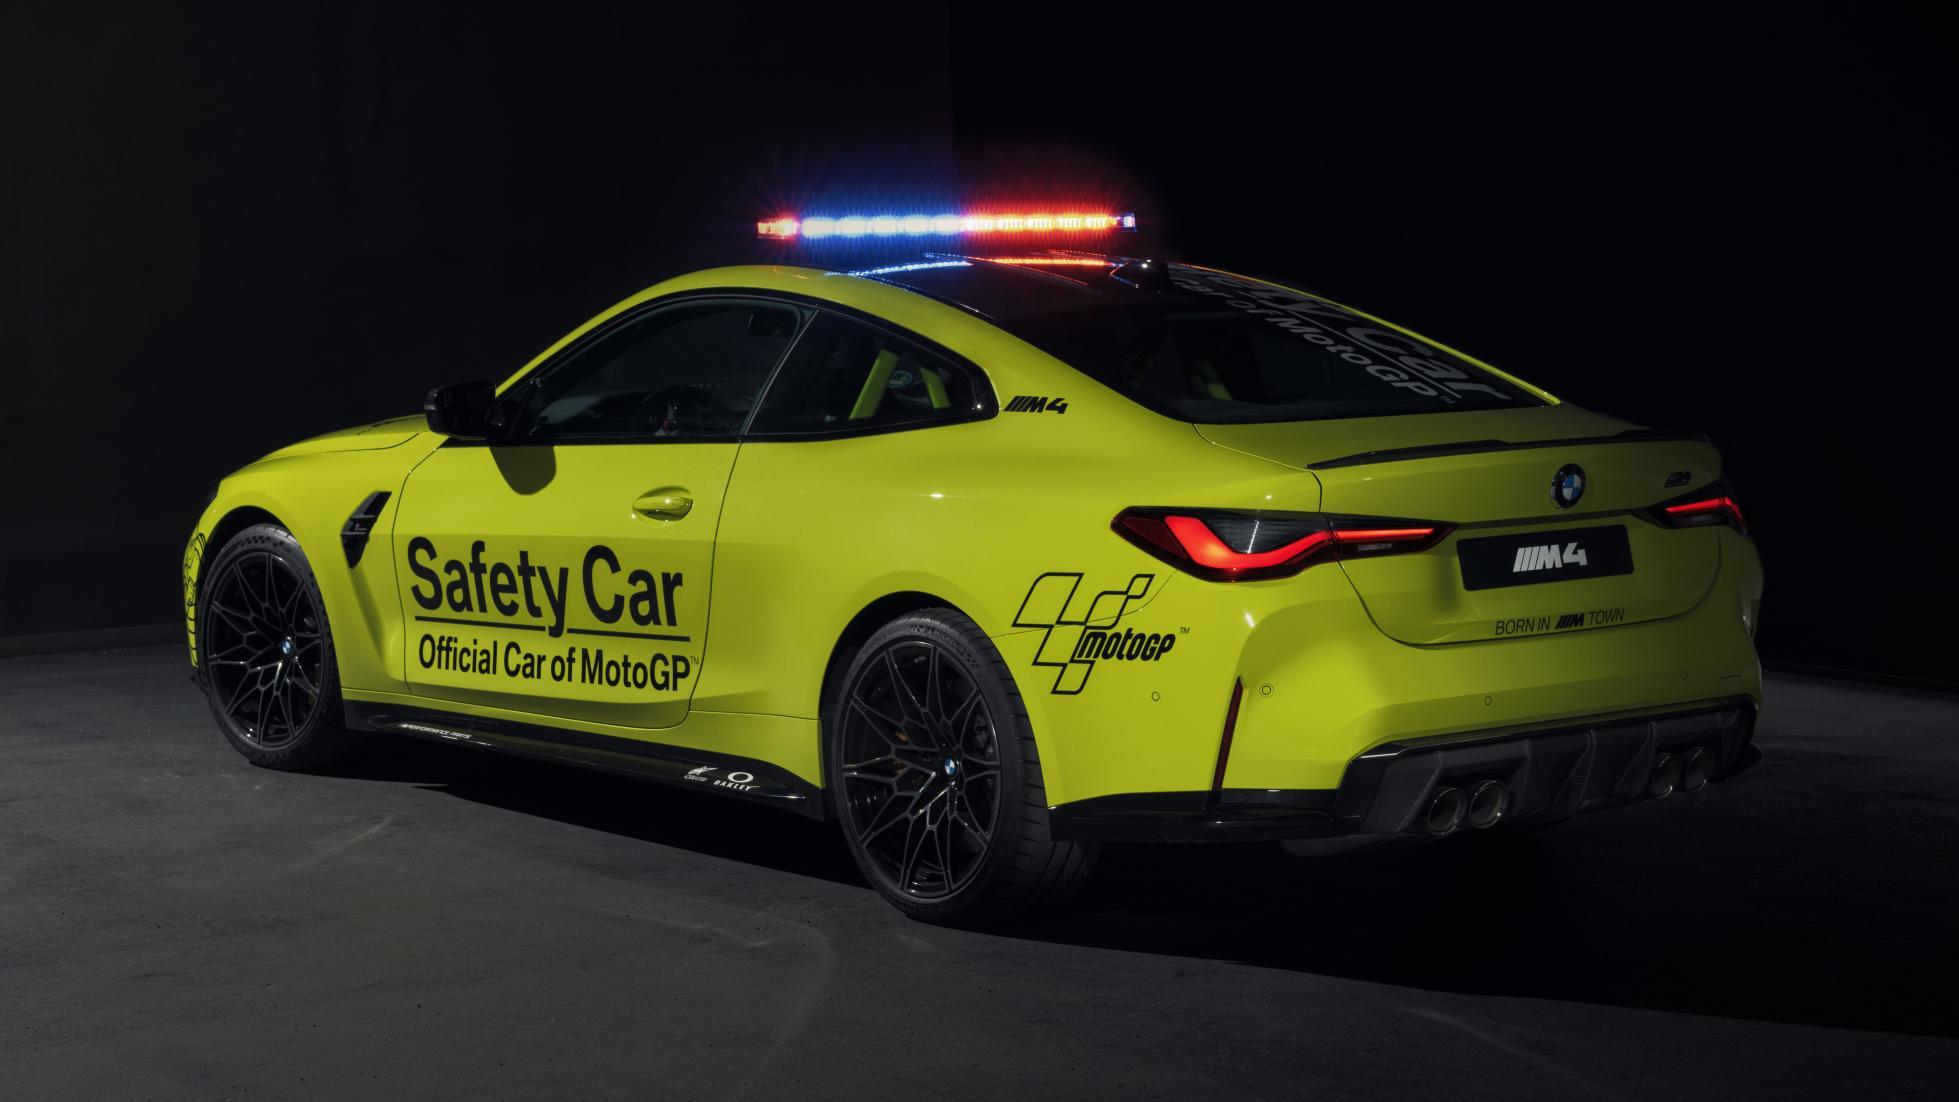 The BMW M4 as a MotoGP safety car, alternative rear view